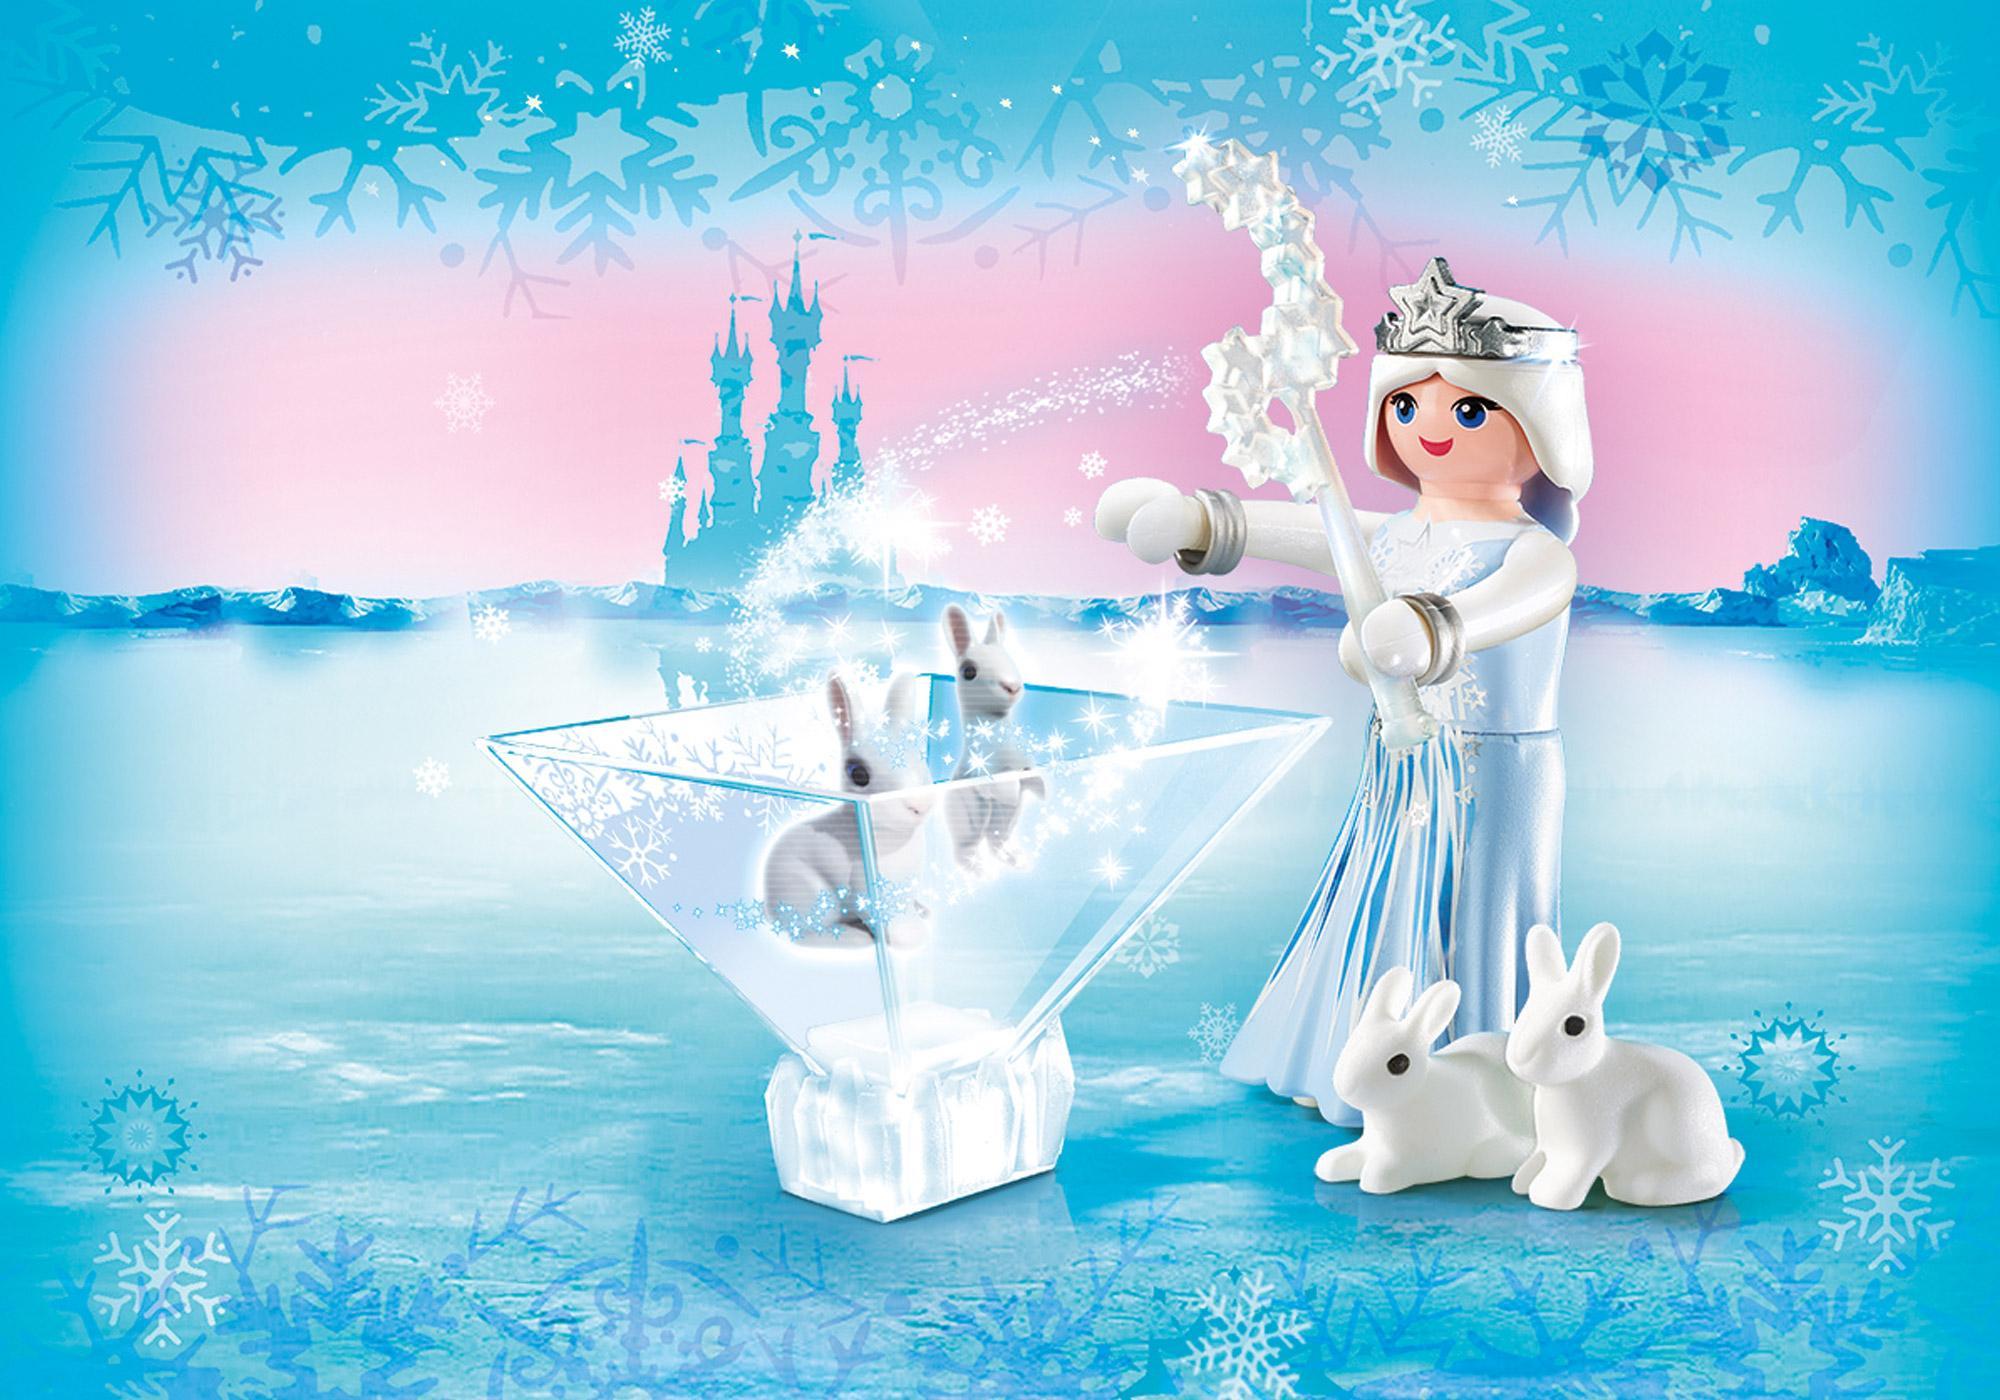 http://media.playmobil.com/i/playmobil/9352_product_detail/Πριγκίπισσα του χειμώνα με λαγουδάκια